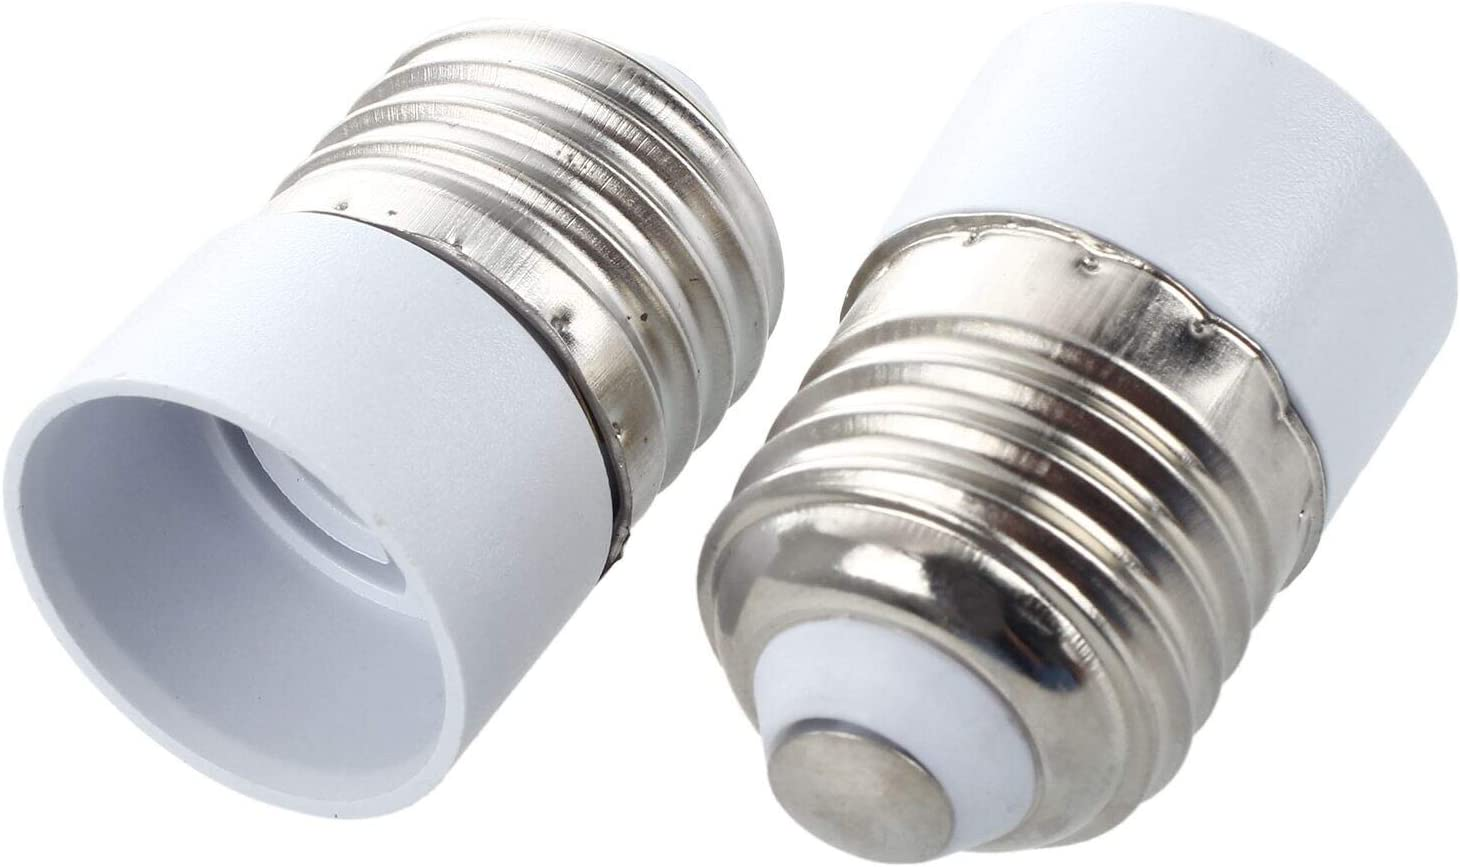 Davitu Electrical Equipments 25% OFF Supplies - 10 to Male Plug E27 E14 Louisville-Jefferson County Mall